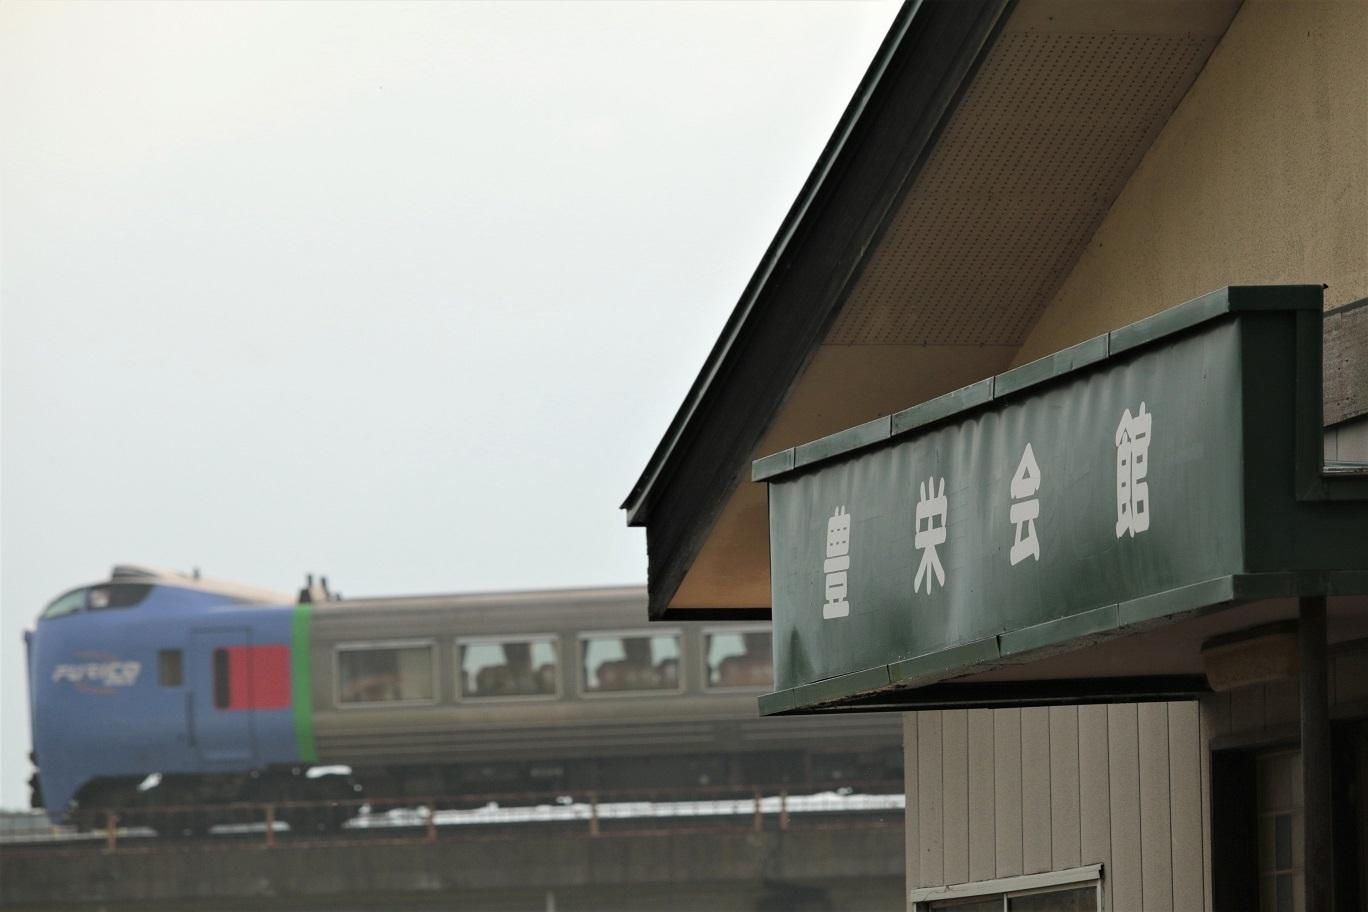 4001D283系おおぞら 追分~南千歳 20.08.07 (4)